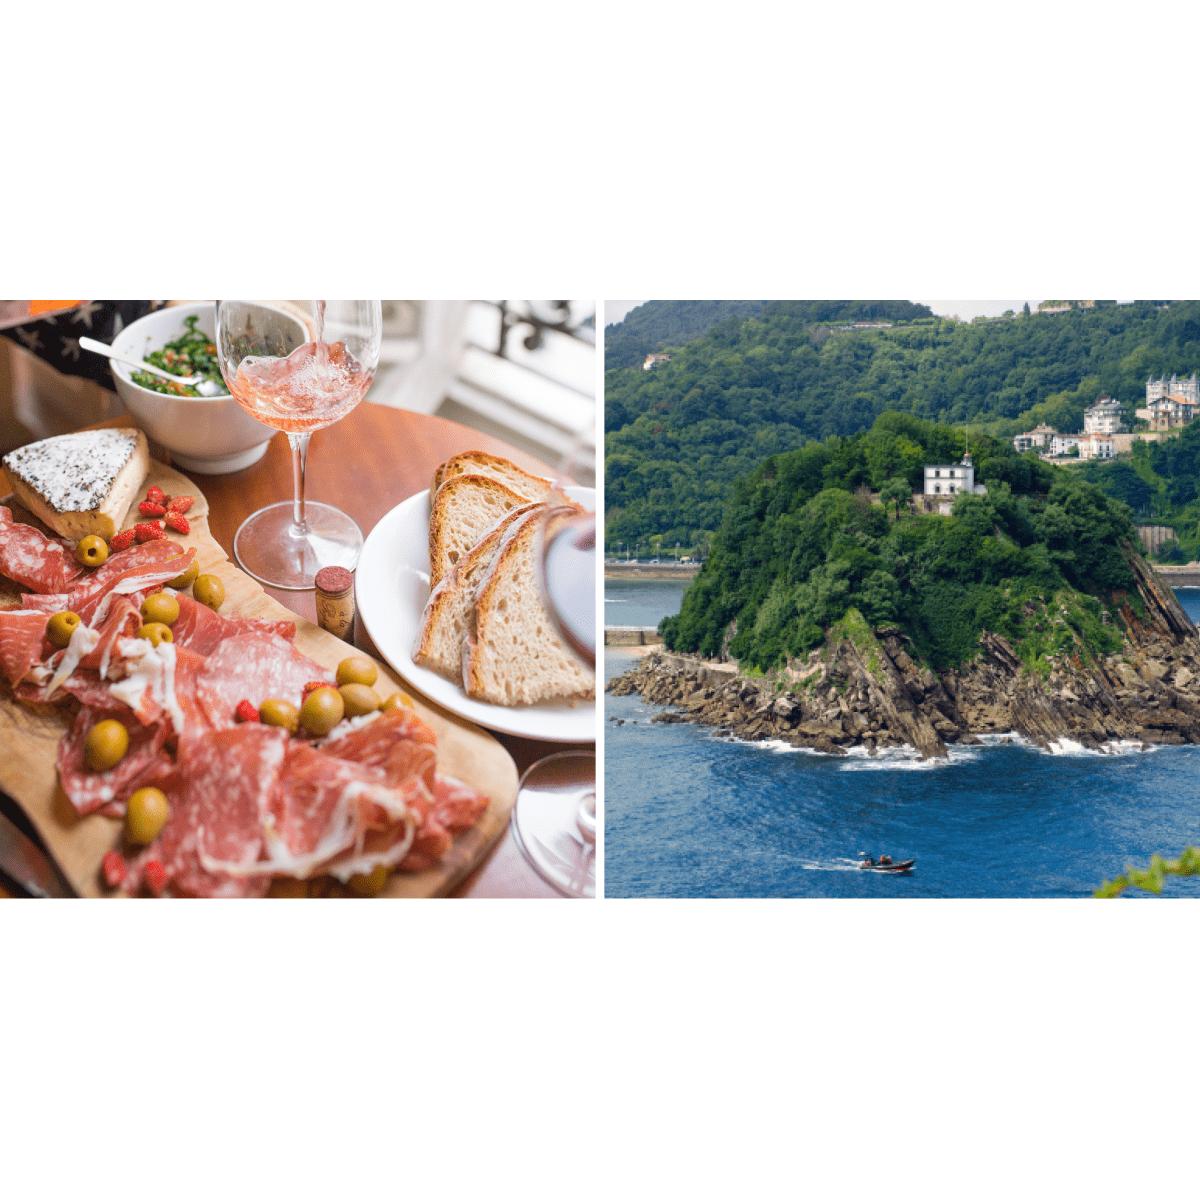 Naya Traveler Culinary Journey Through Spain